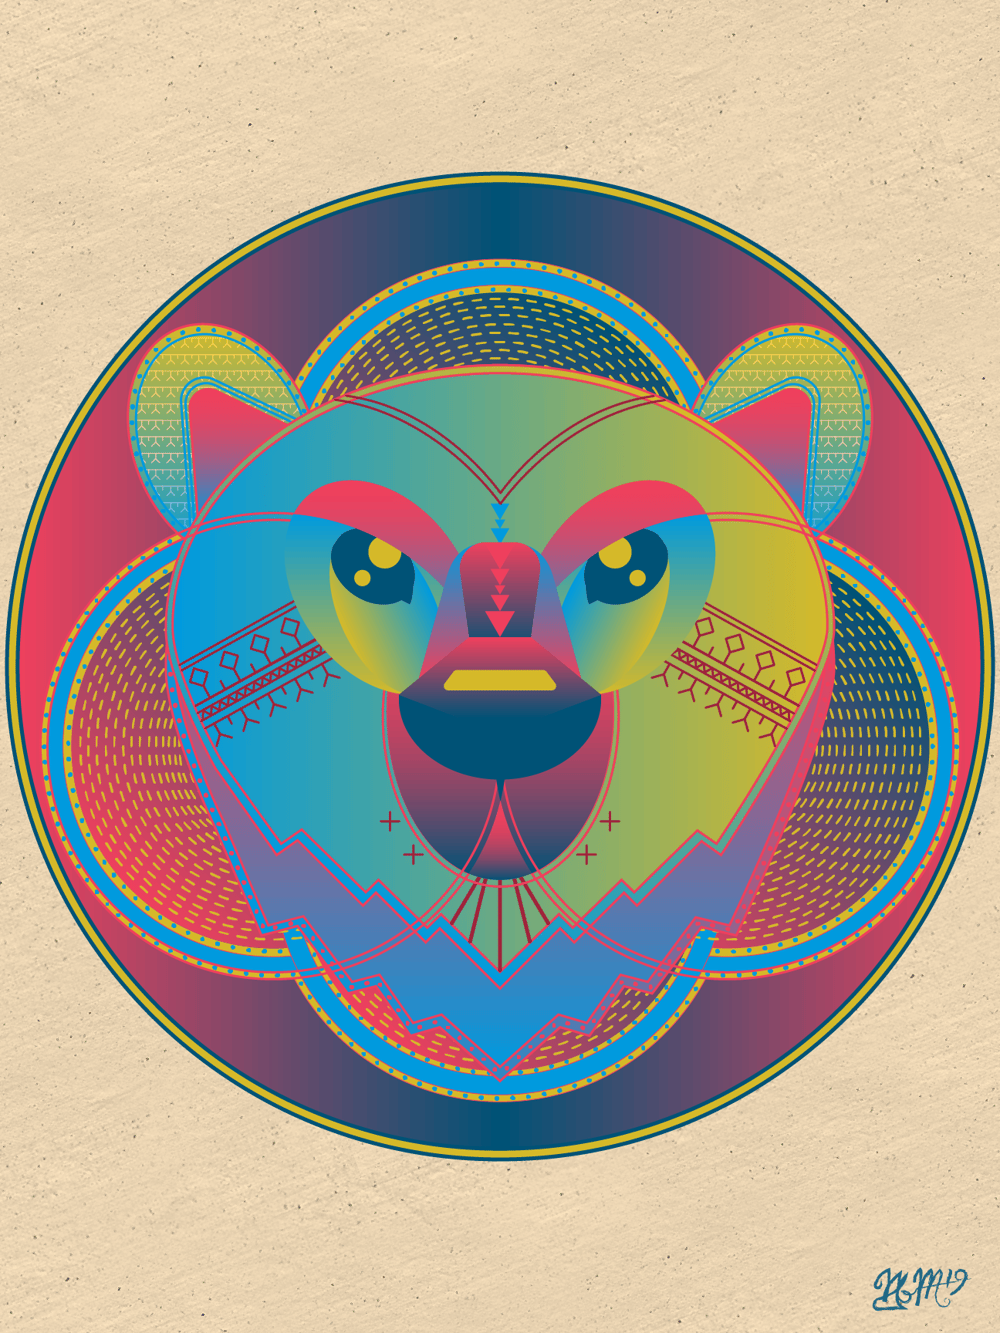 Polar Bear - image 6 - student project